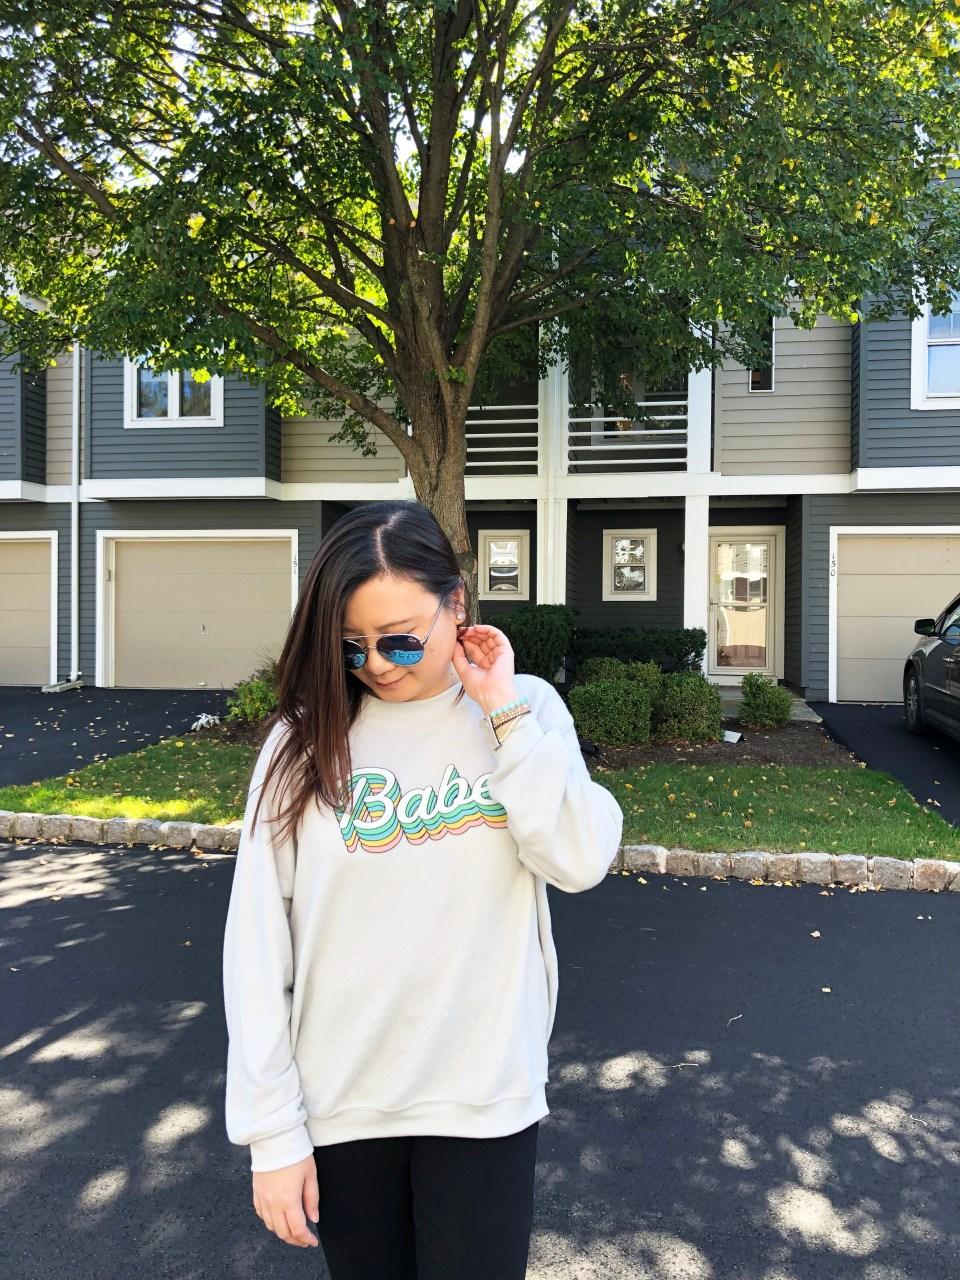 Babe Sweatshirt 6